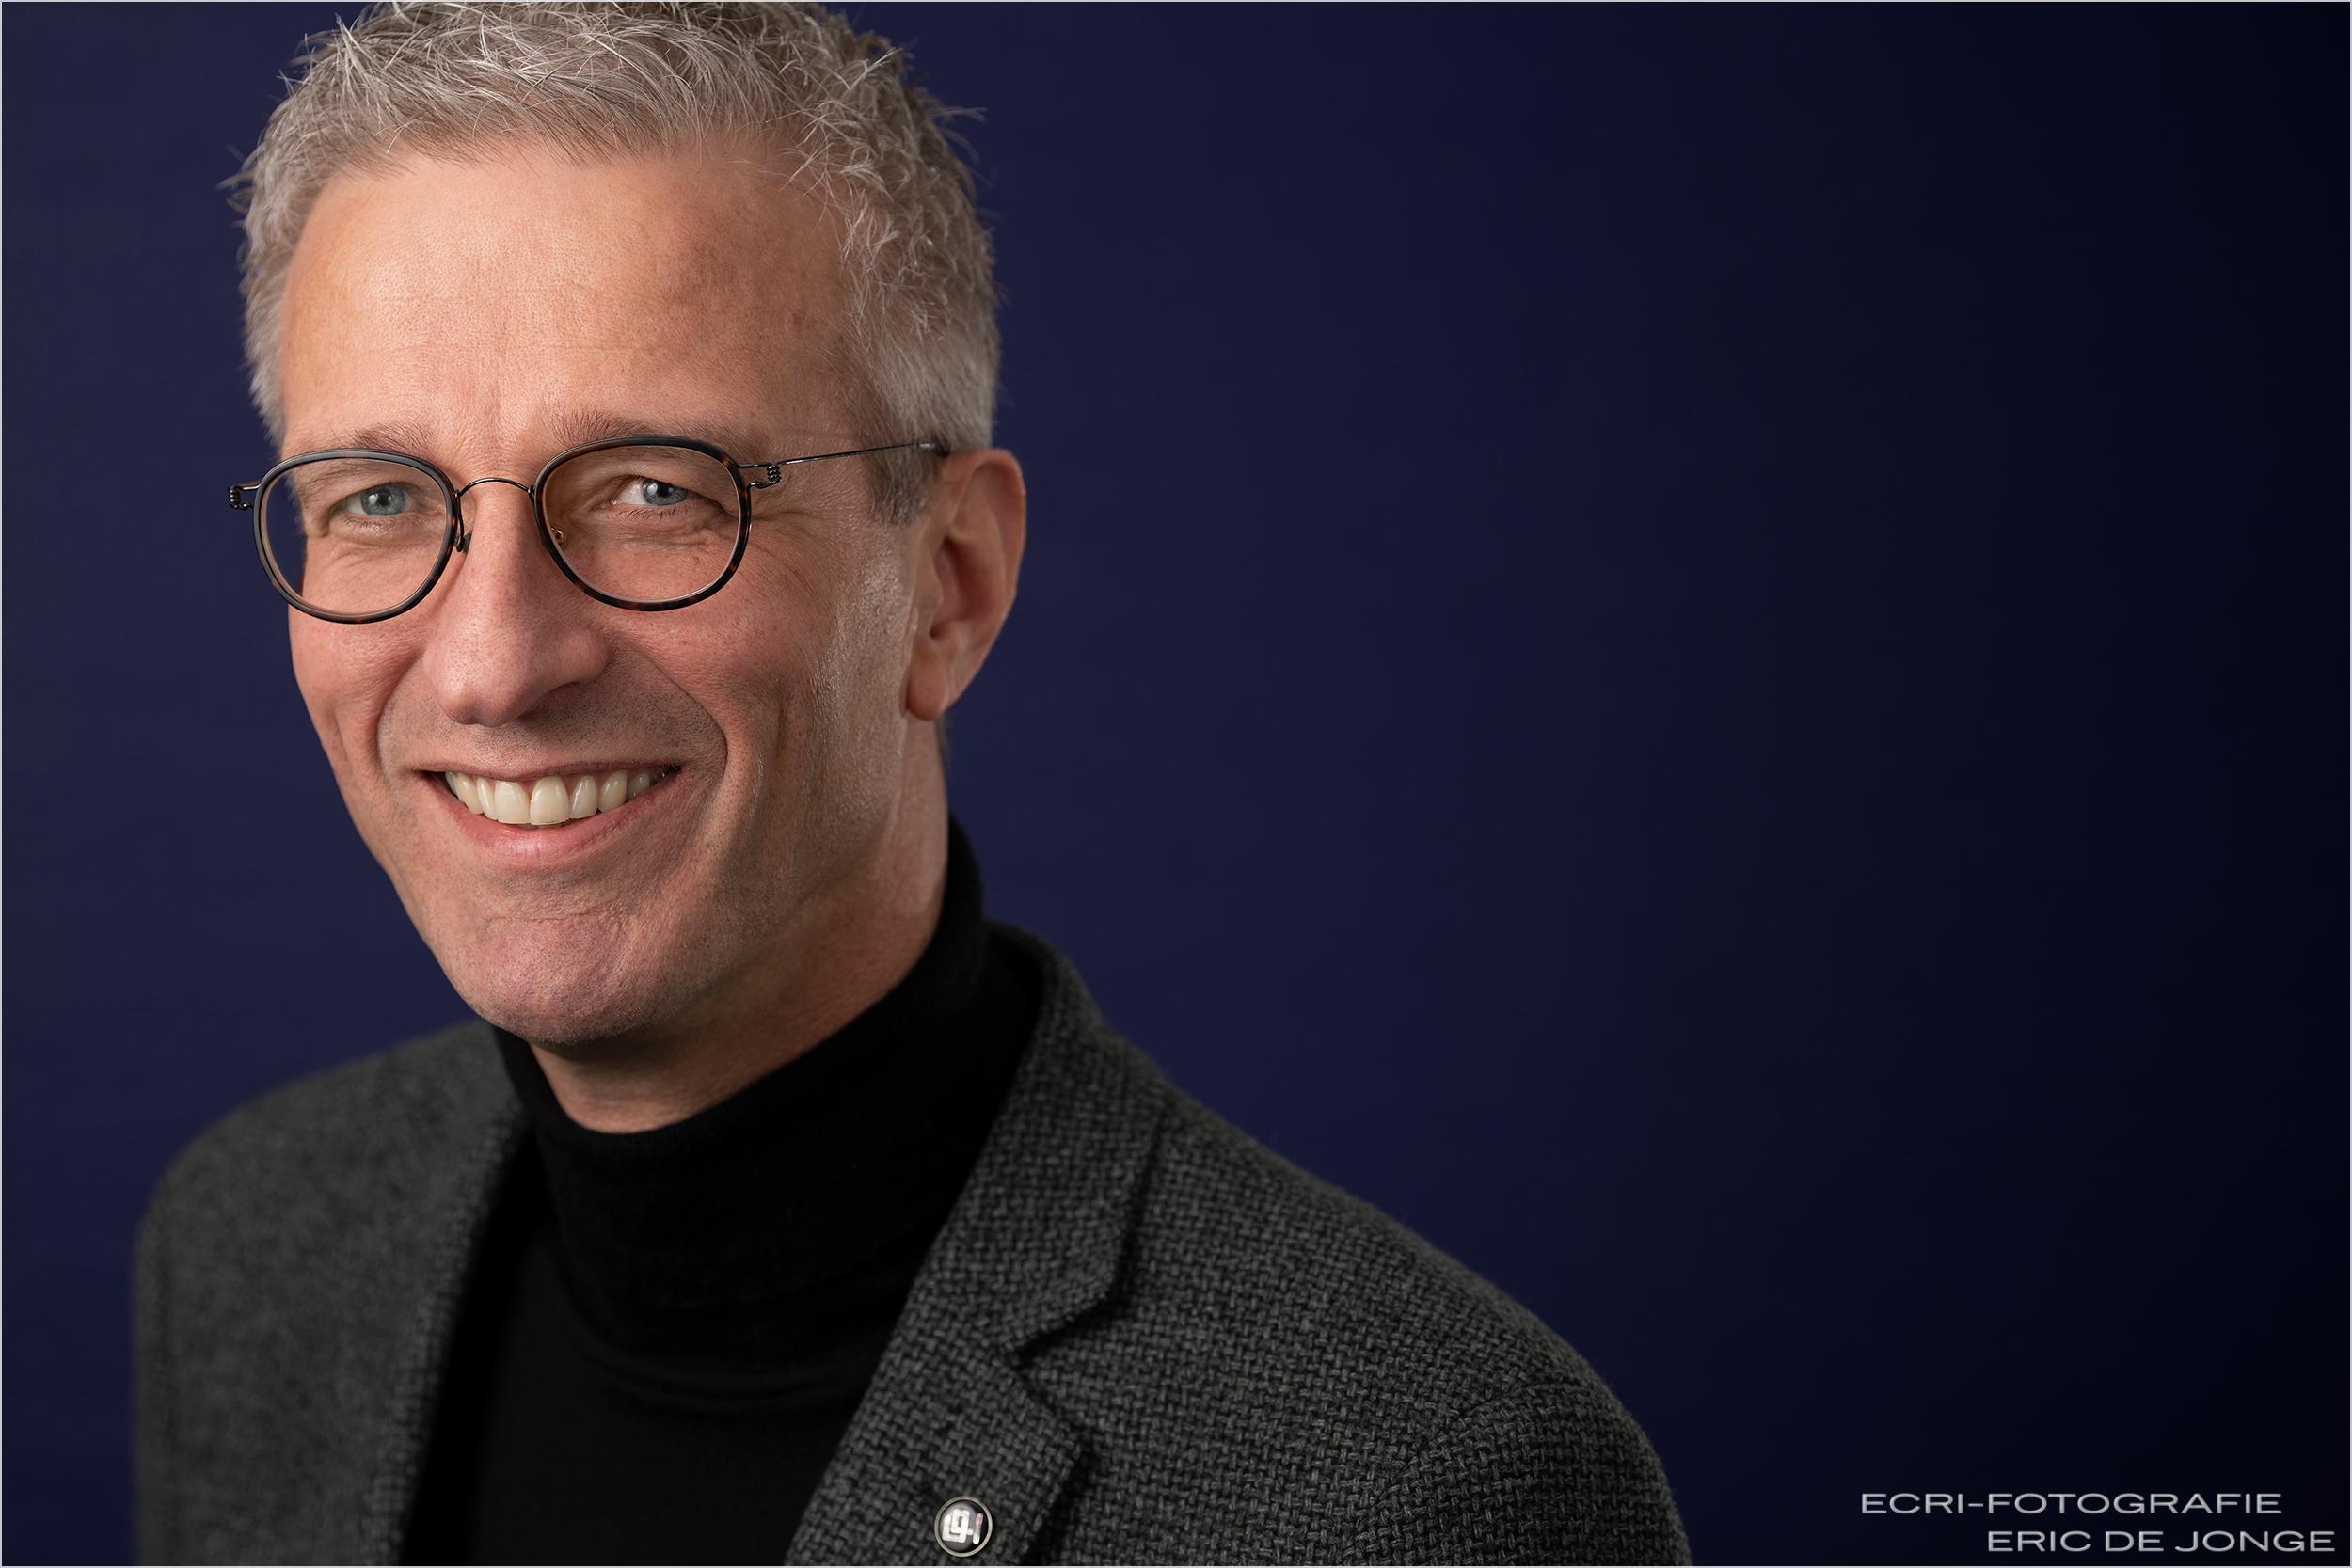 bedrijfsfotografie, ecri-fotografie.nl Brandsma Verzekeringe, Eric de Jonge, portretfotograaf, headshot